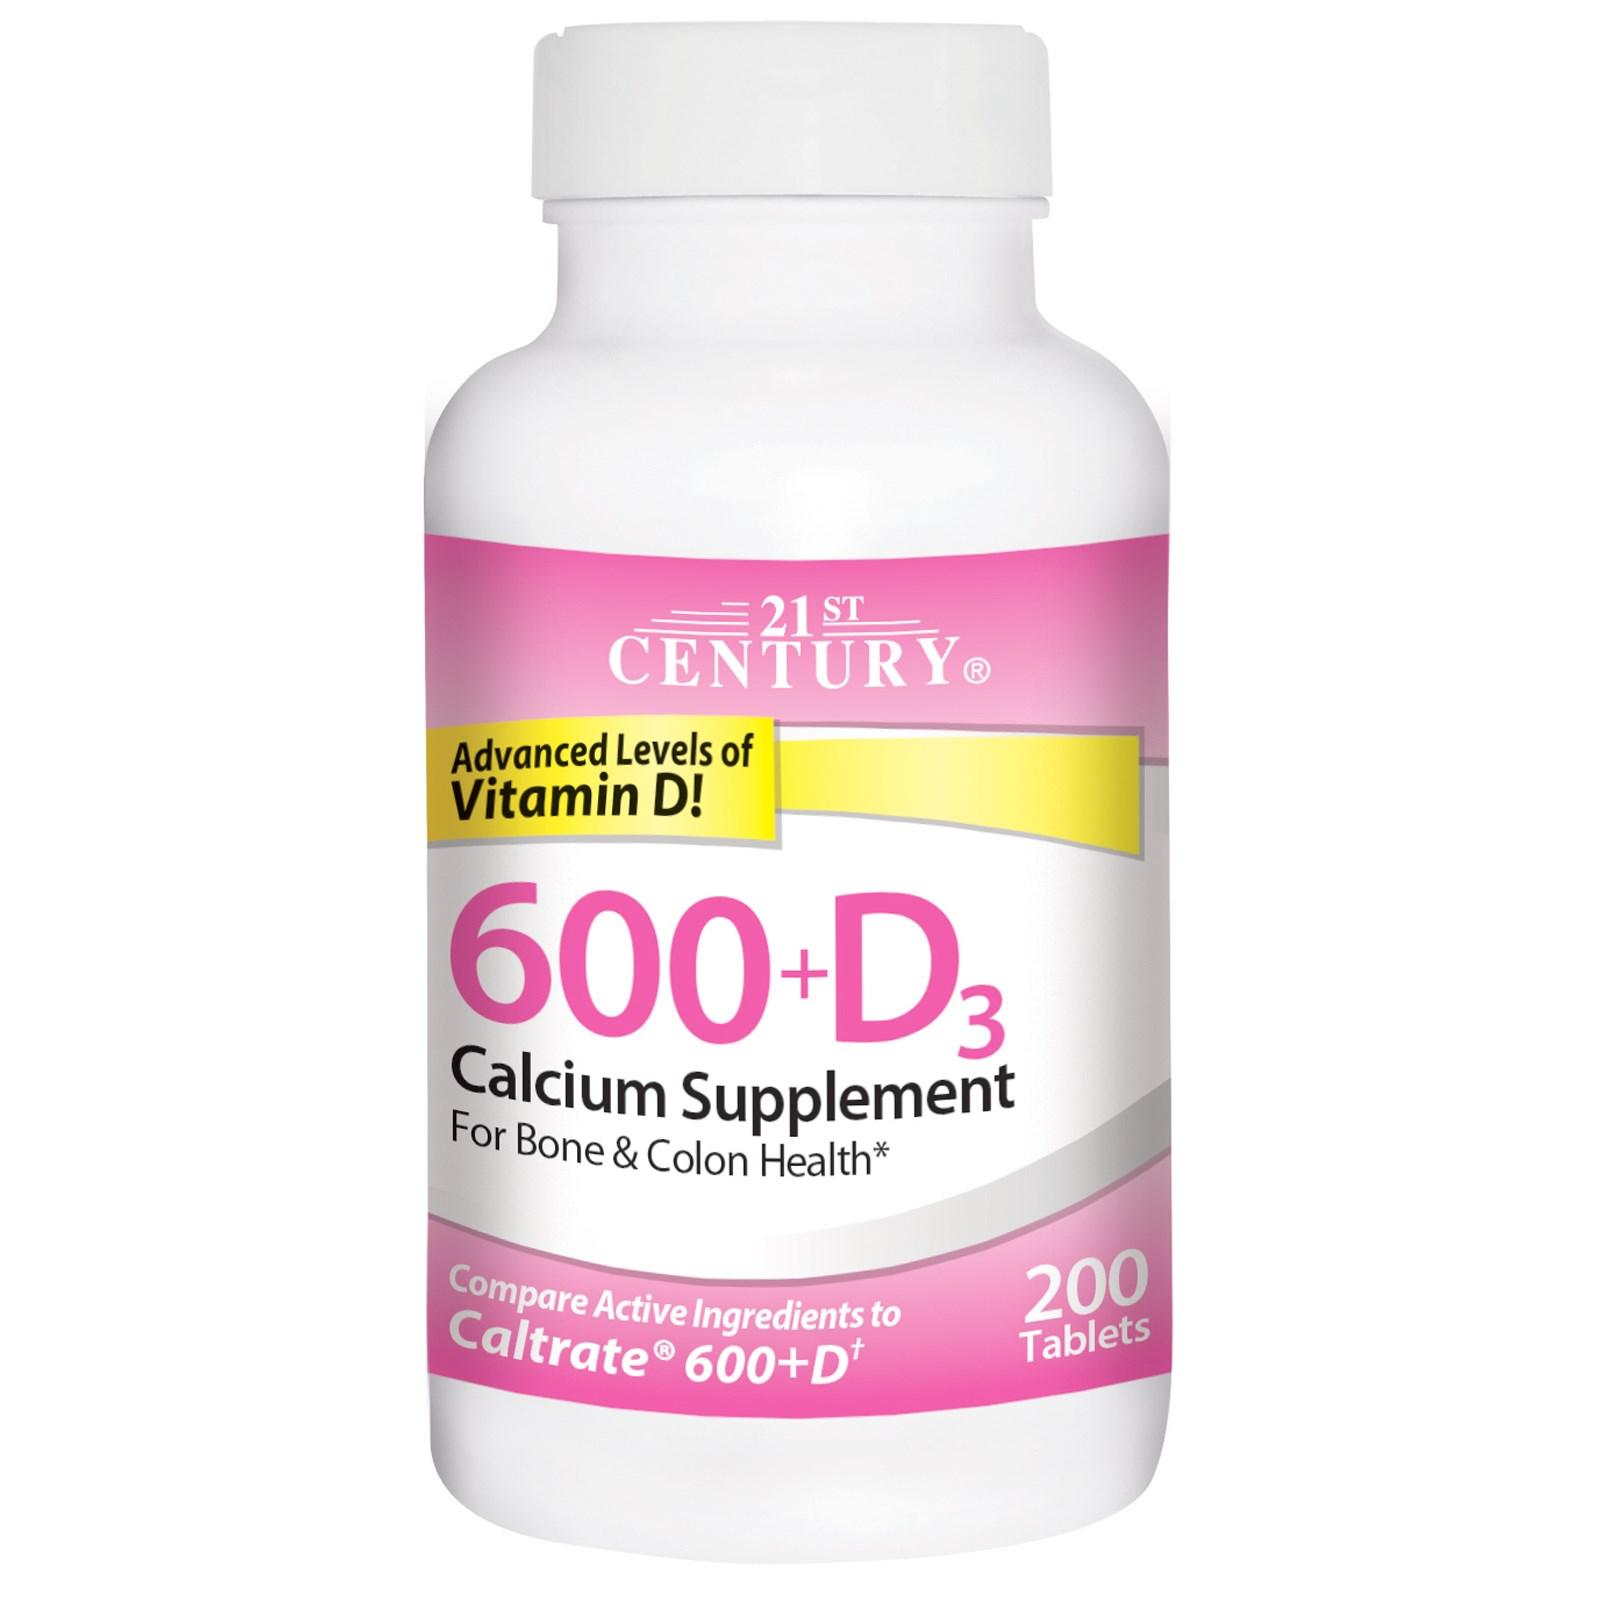 21st Century, 600+D3, кальциевая добавка, 200 таблеток